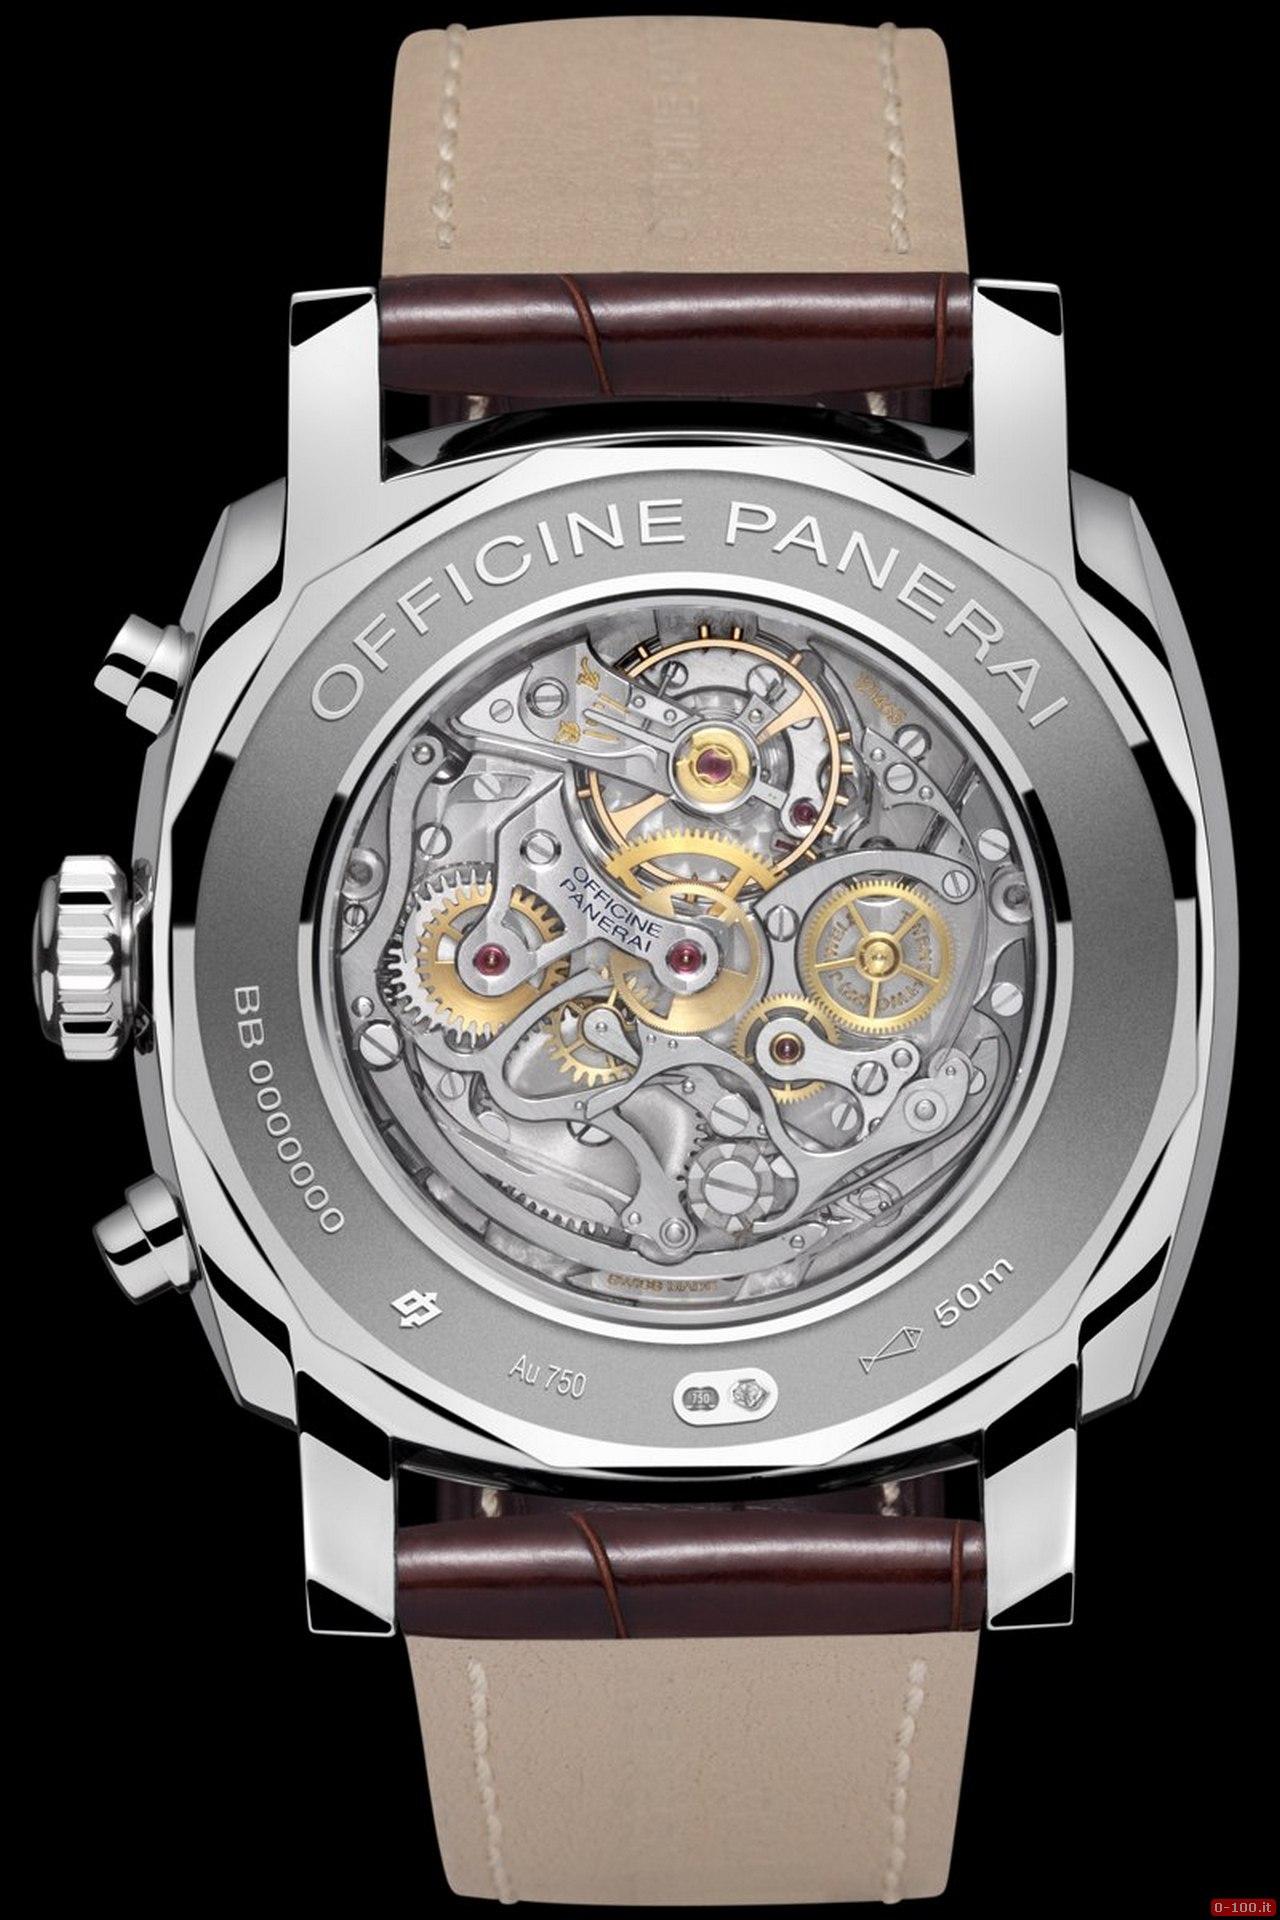 sihh-2014-panerai-radiomir-1940-chronograph-collection-limited-edition_0-100_14